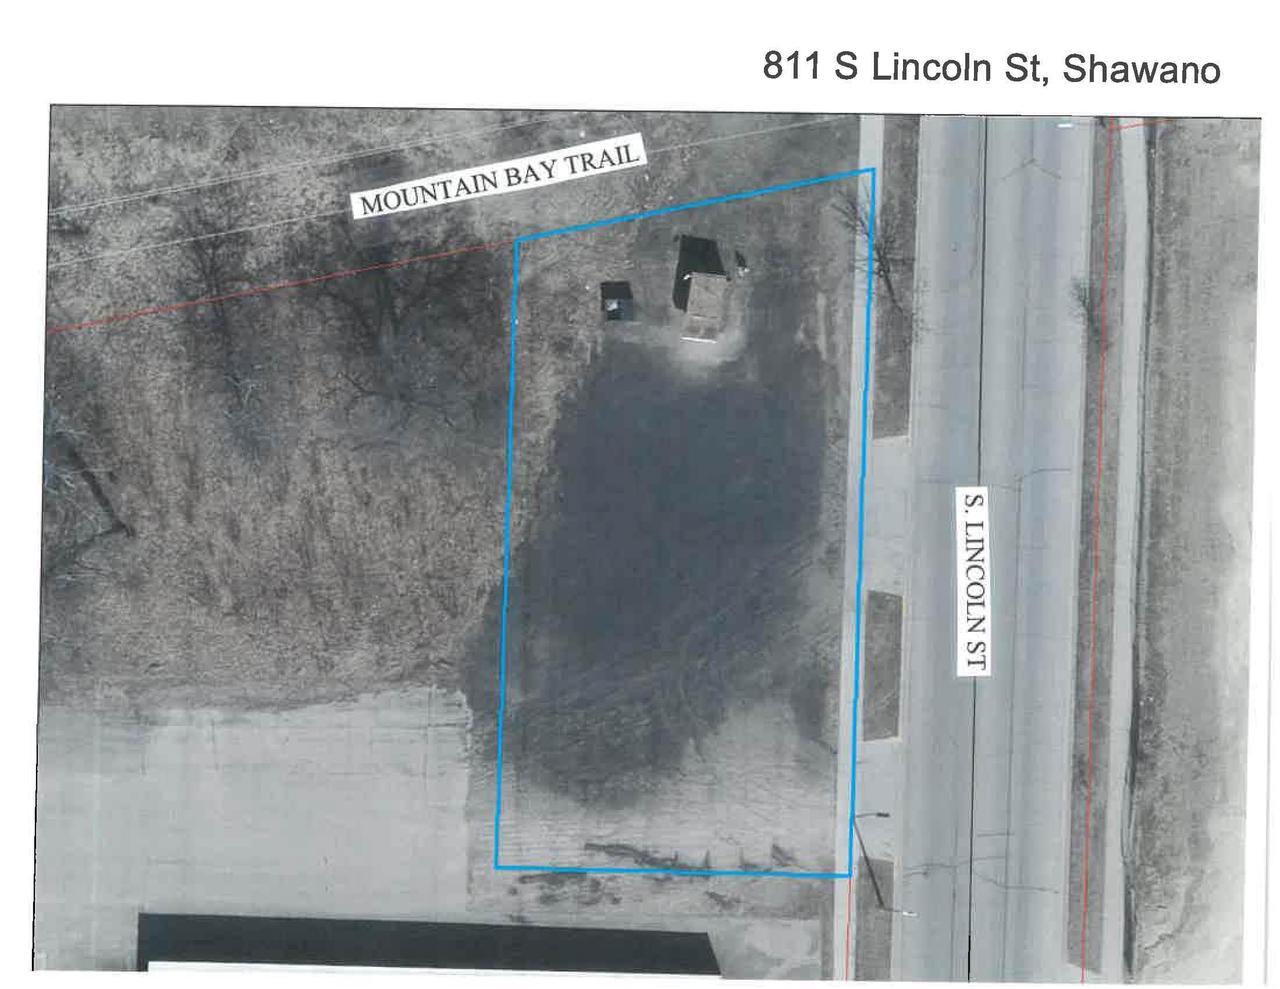 811 S Lincoln St STREET, SHAWANO, WI 54166